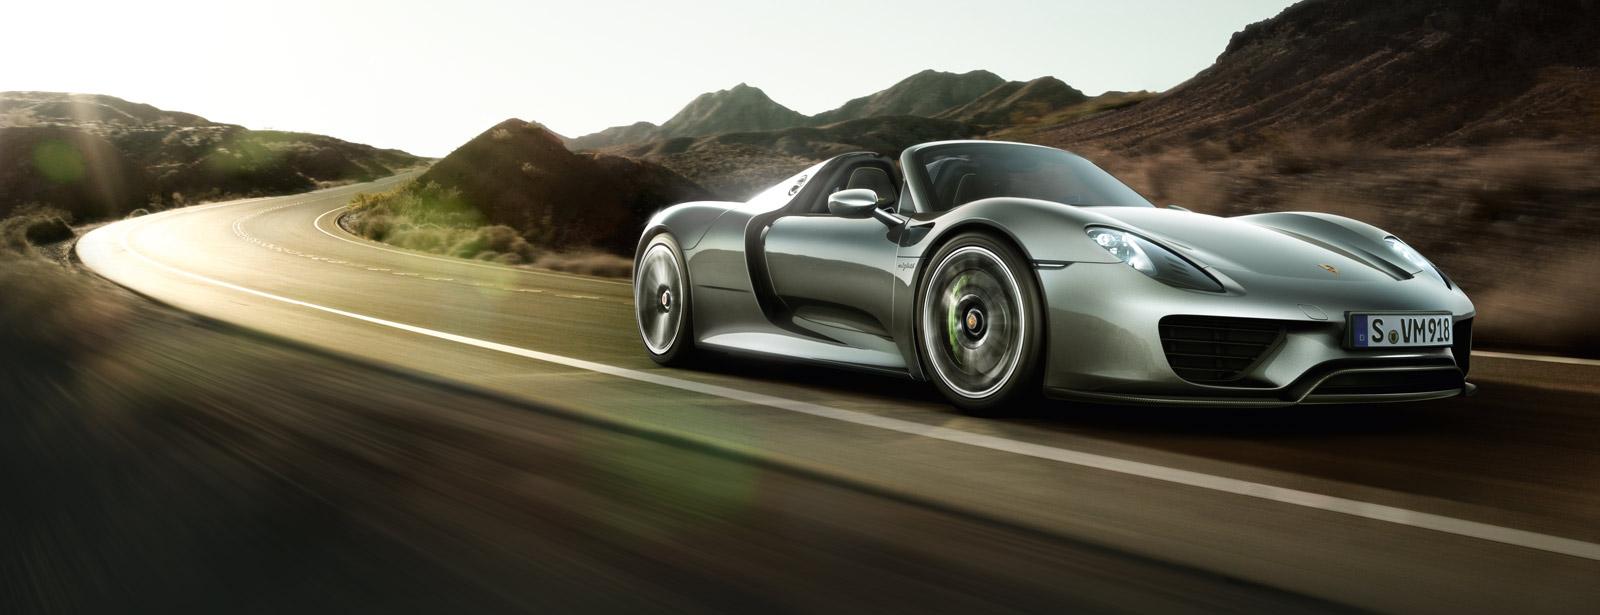 New Porsche 918 for Sale Cicero NY